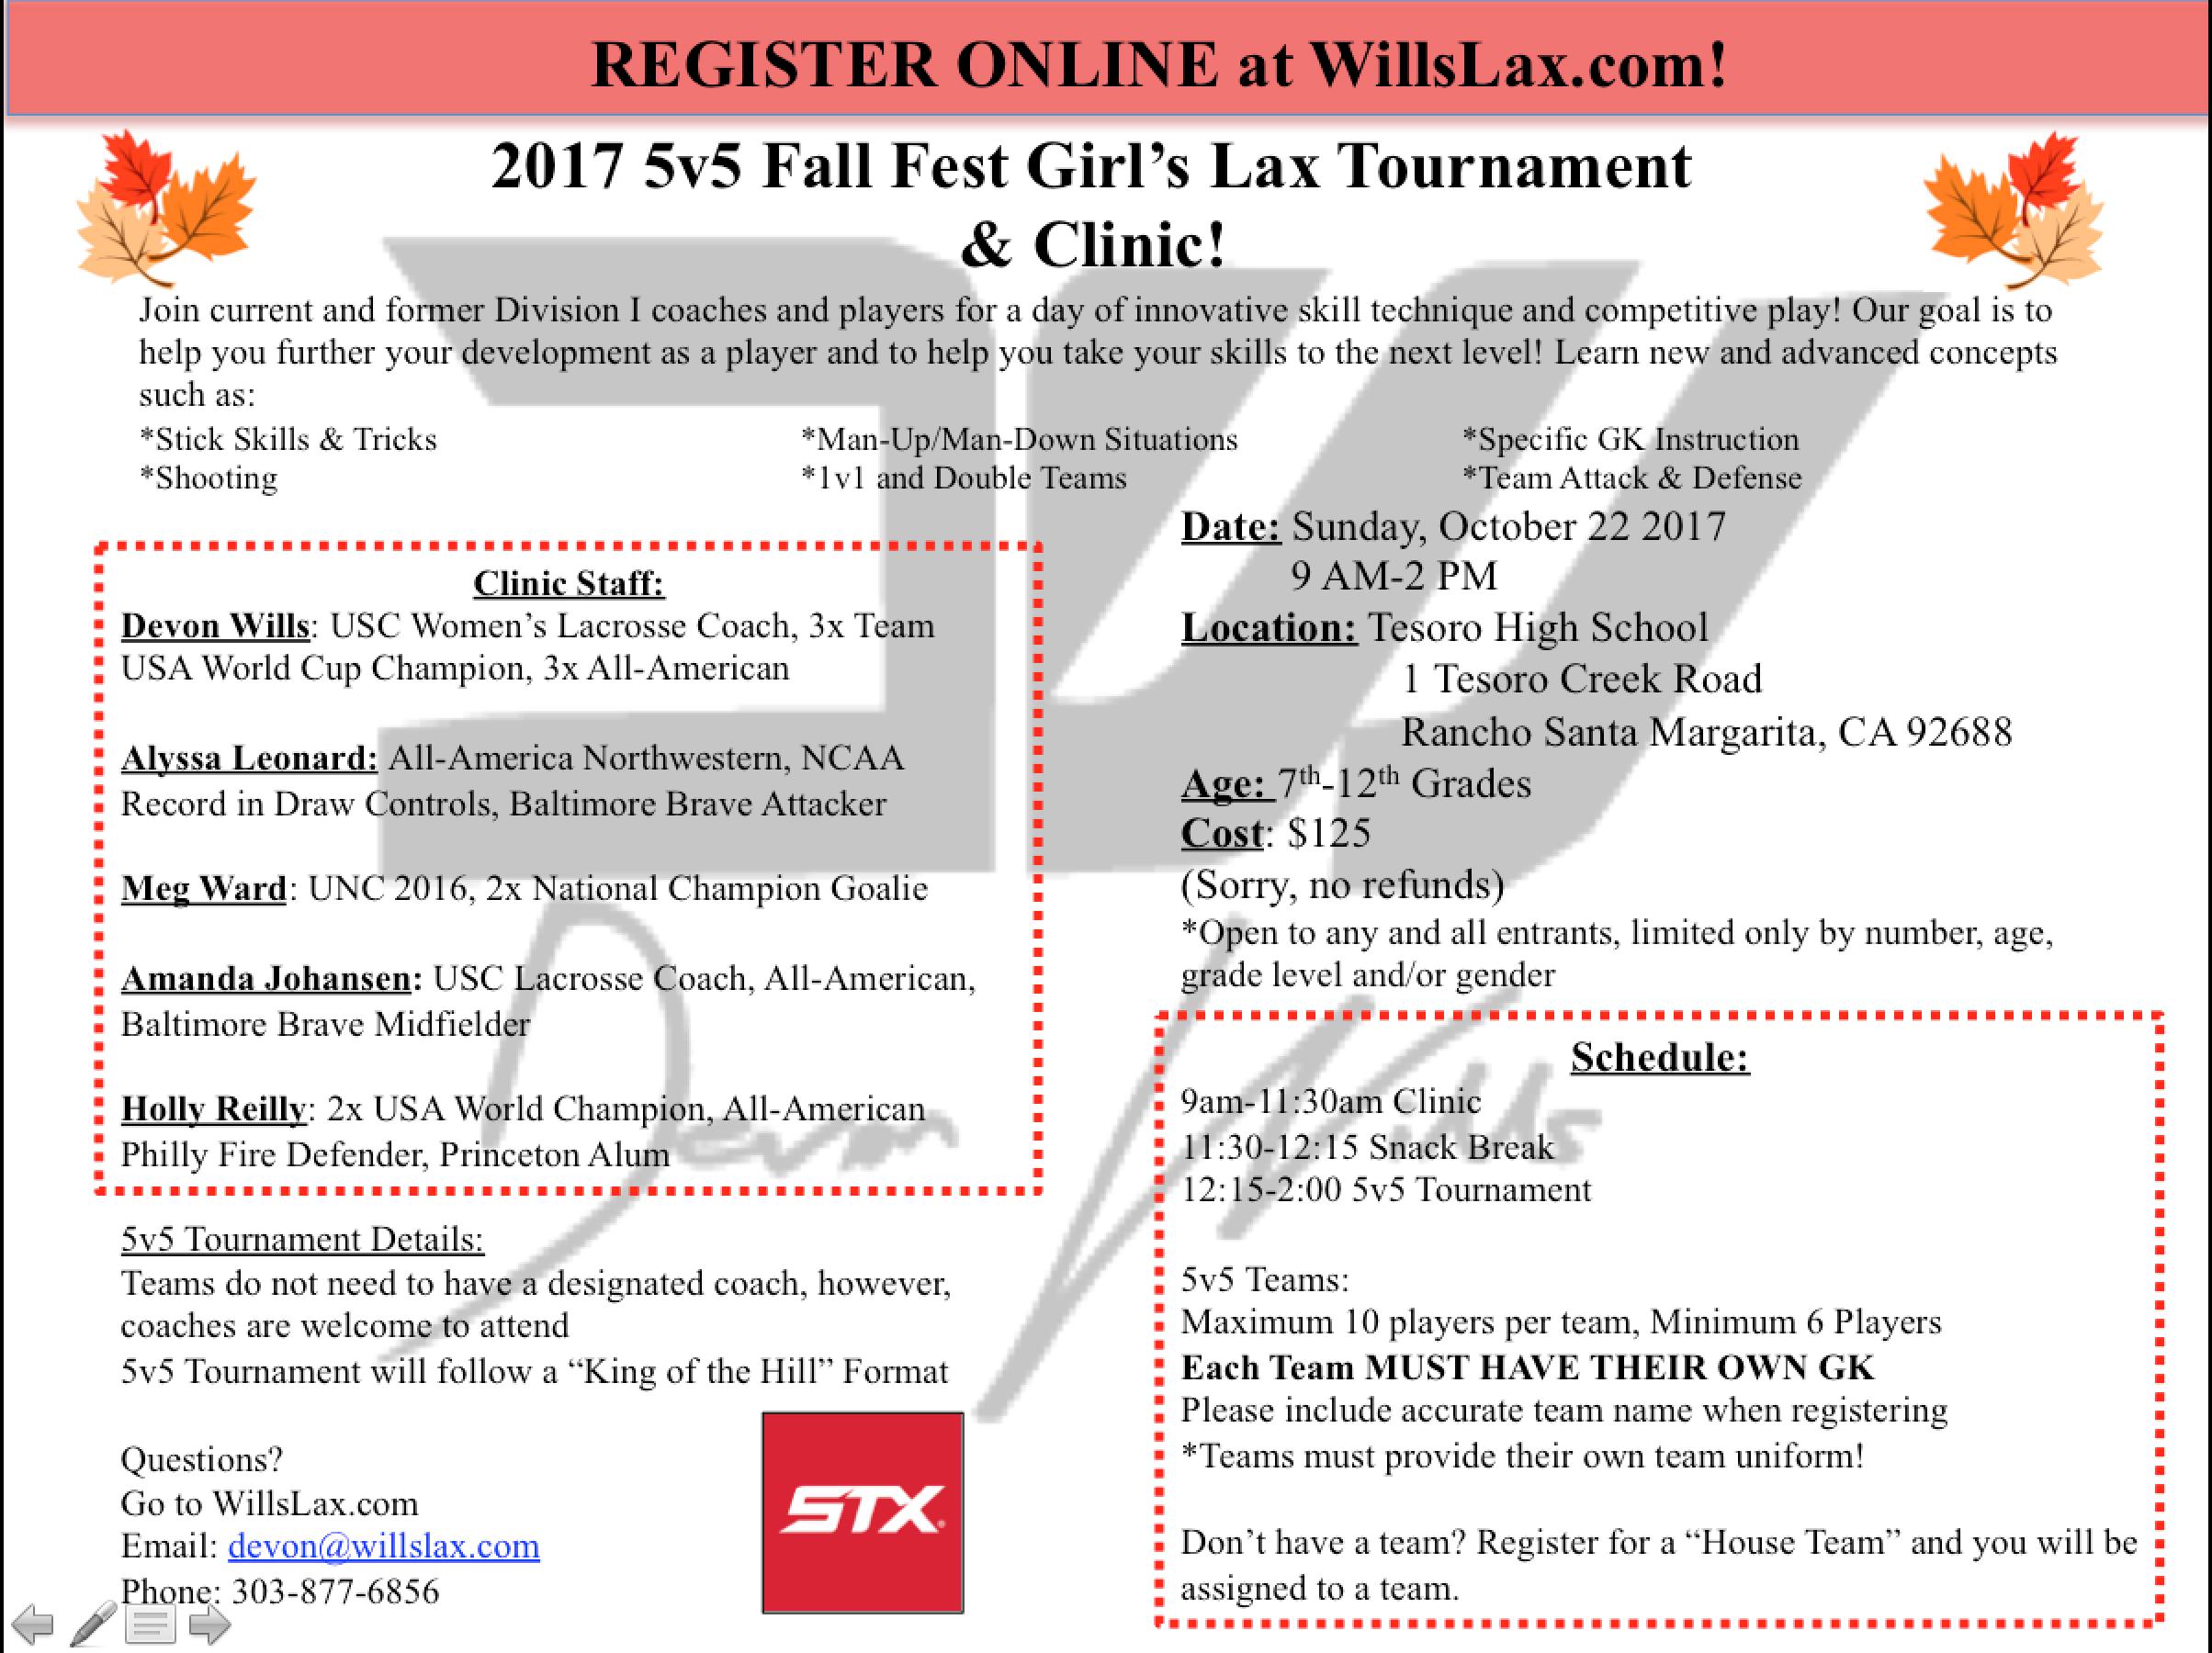 Devon Wills 5v5 girls lacrosse tournament and clinic